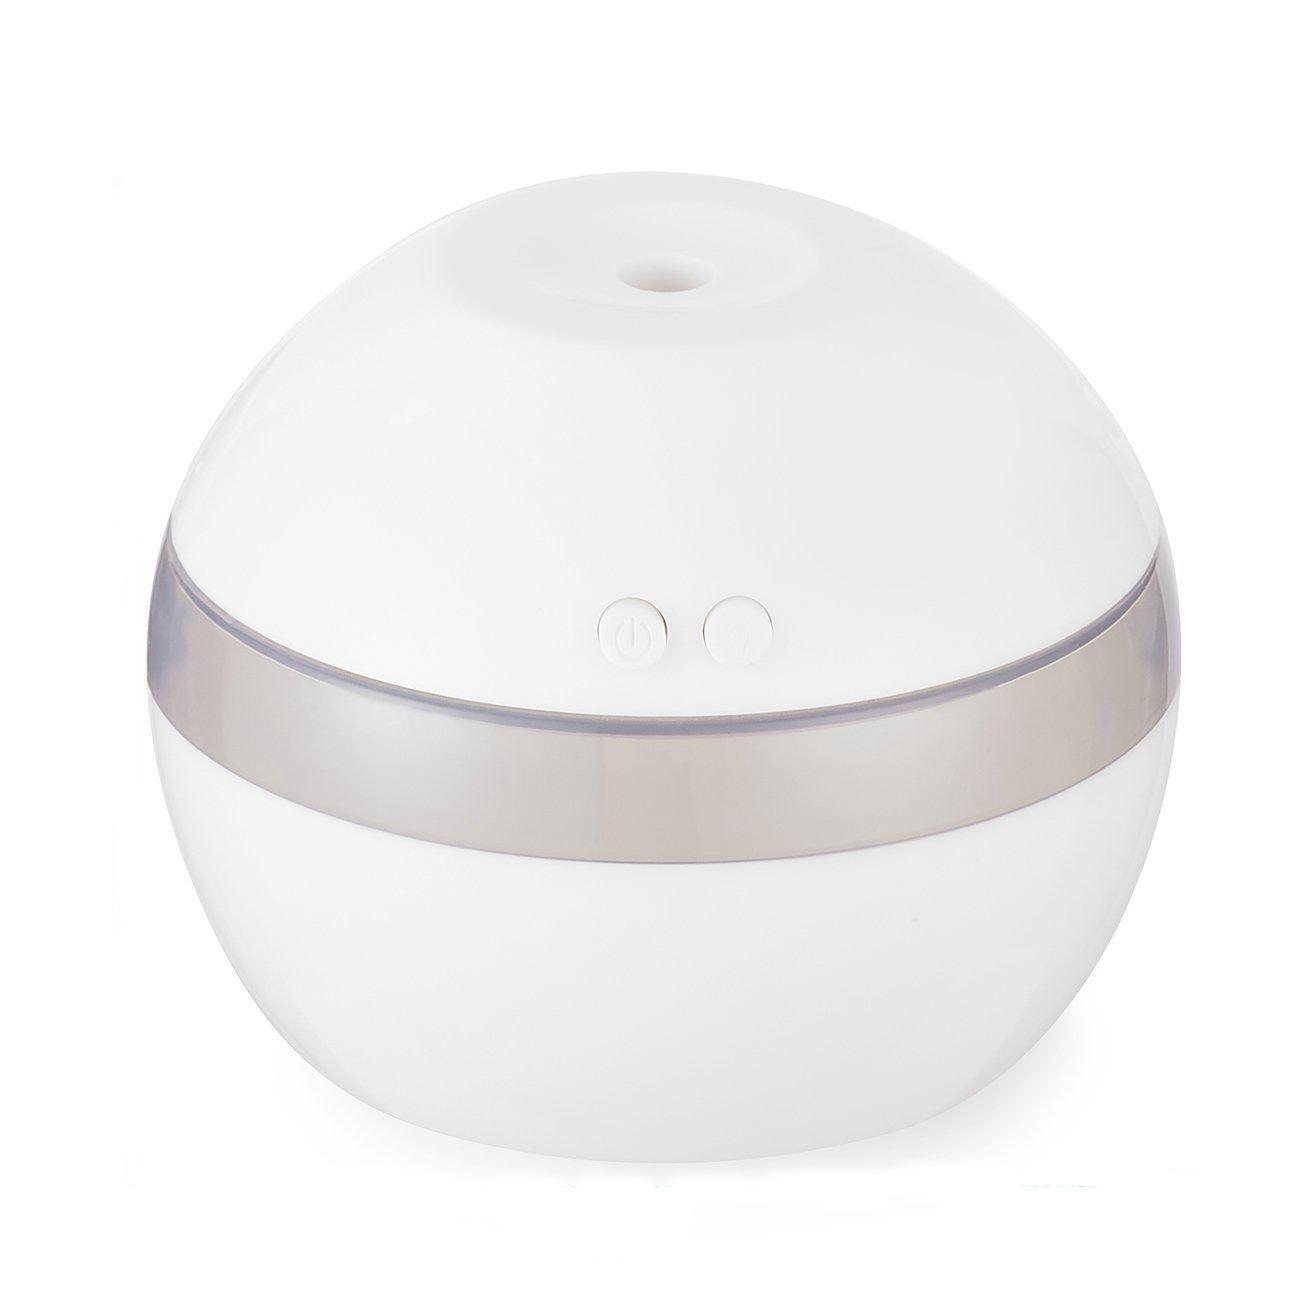 Mini Bedroom Humidifier,Ultrasonic Cool Mist Desk Diffuser,Portable USB Humidifier for Travel Home Office portable mini usb humidifier ultrasonic 160ml cool mist car air purifier for bedroom office house desktop spa baby kids